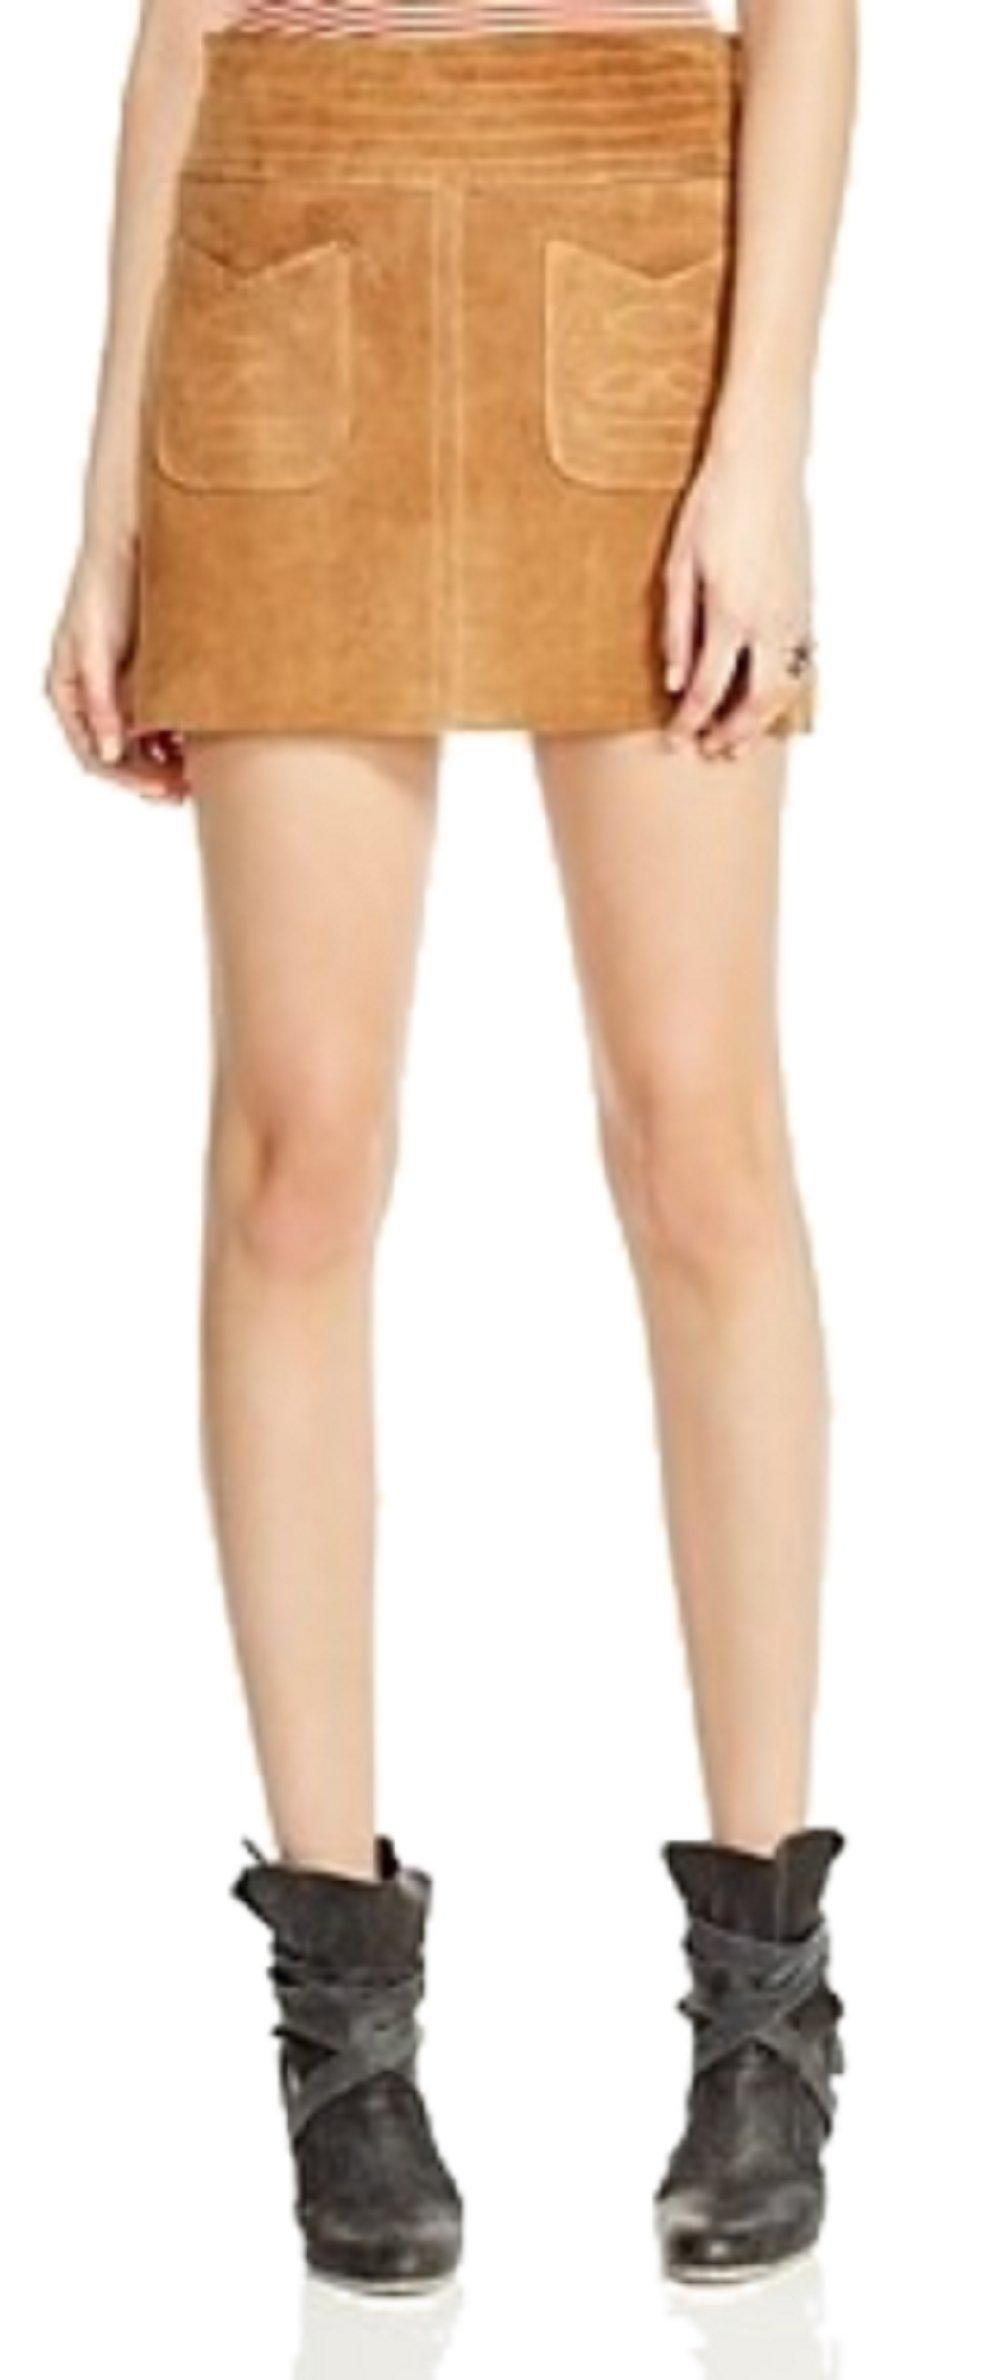 Free People Modern Love Suede Mini Skirt, Brown, Size 10